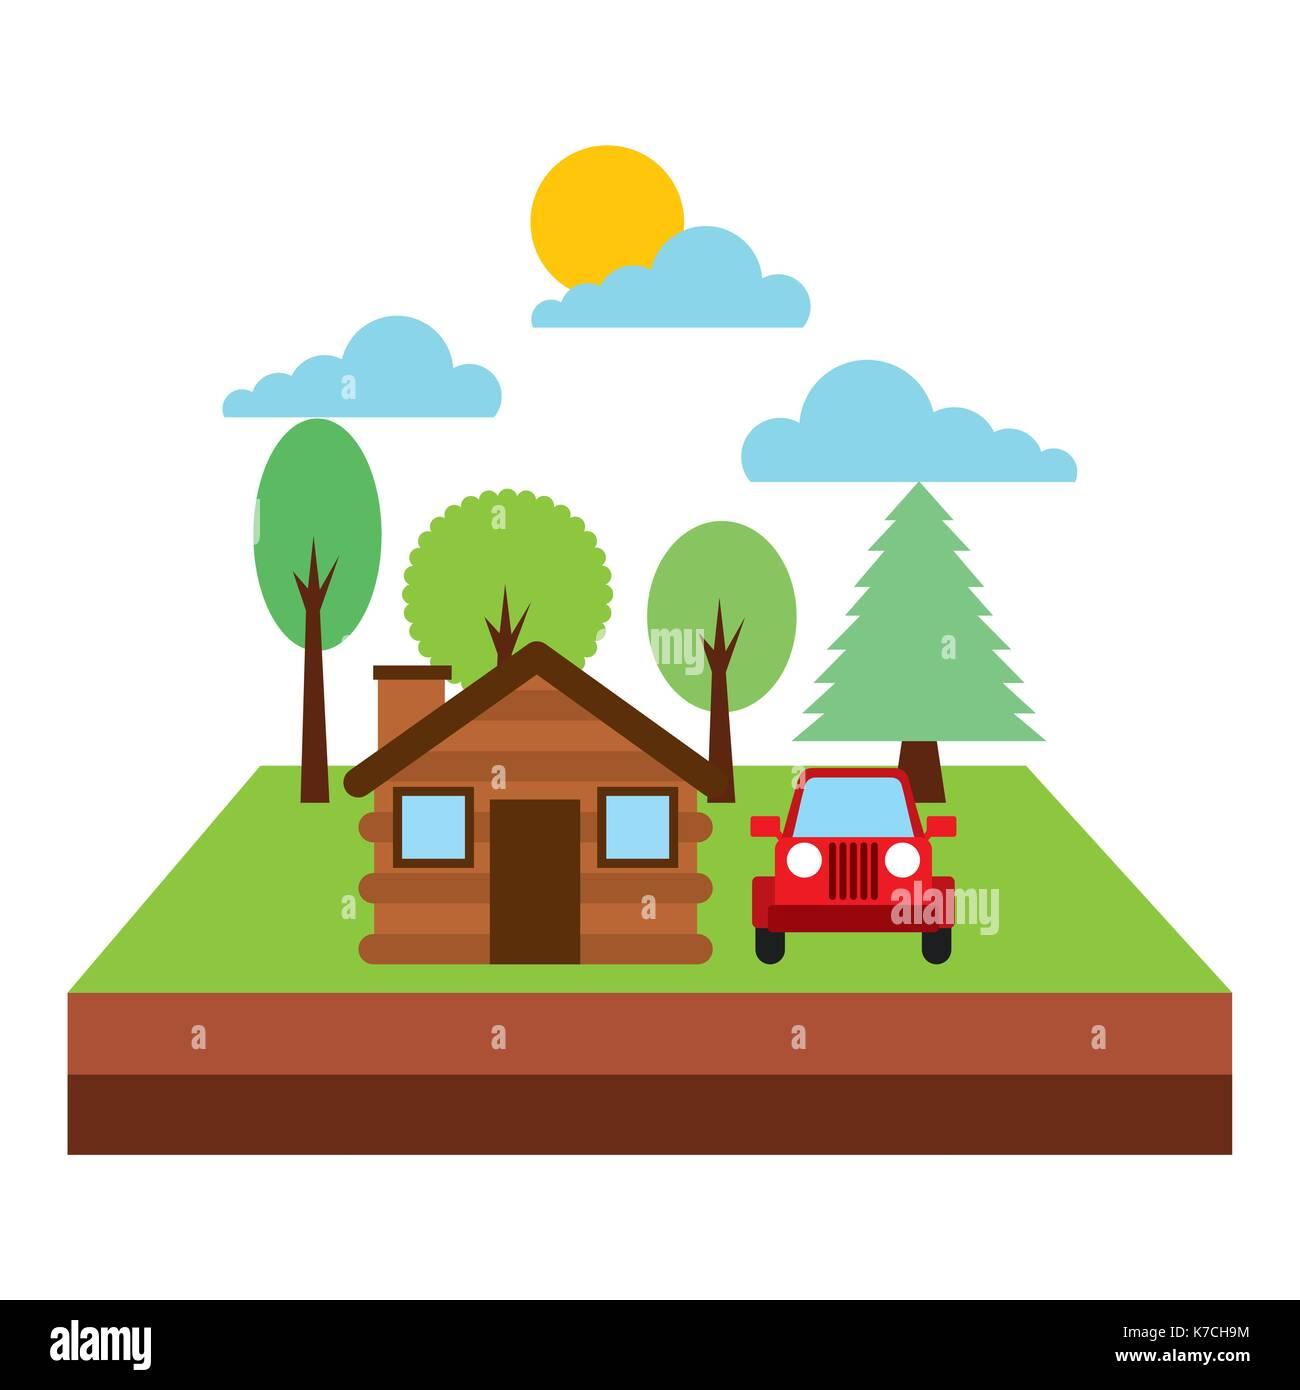 forest cottage house jeep natural landscape - Stock Image